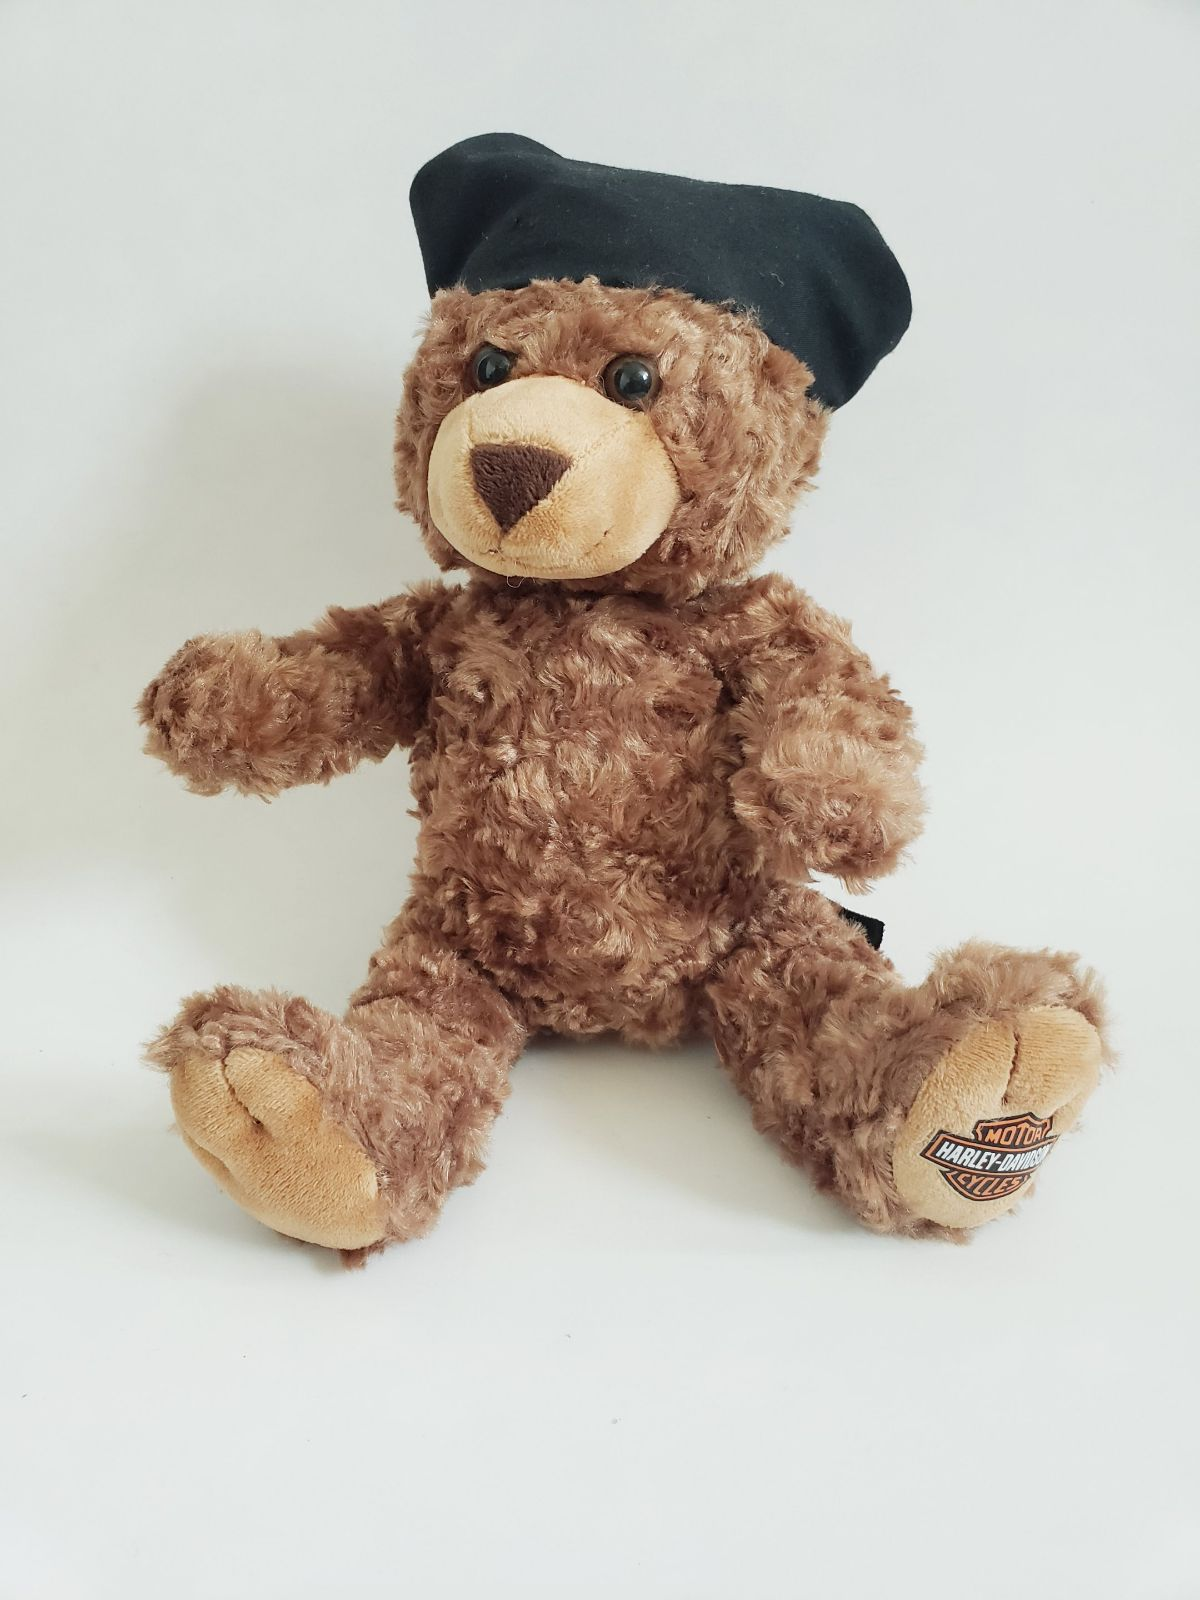 Harley Davidson stuffed teddy bear